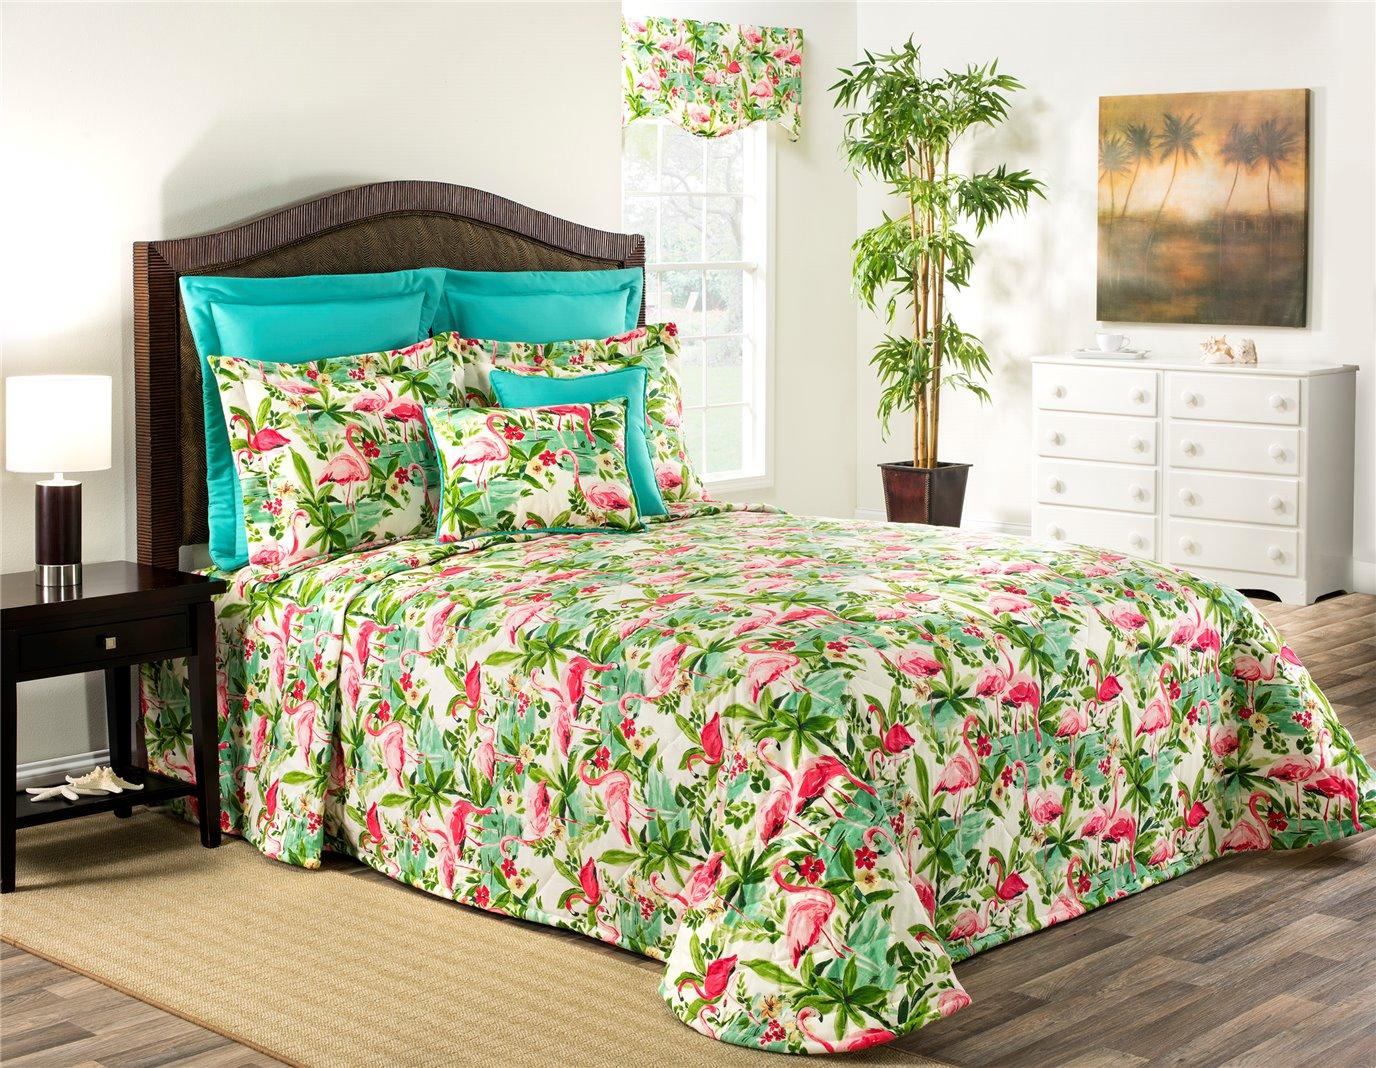 Floridian Flamingo California King Bedspread